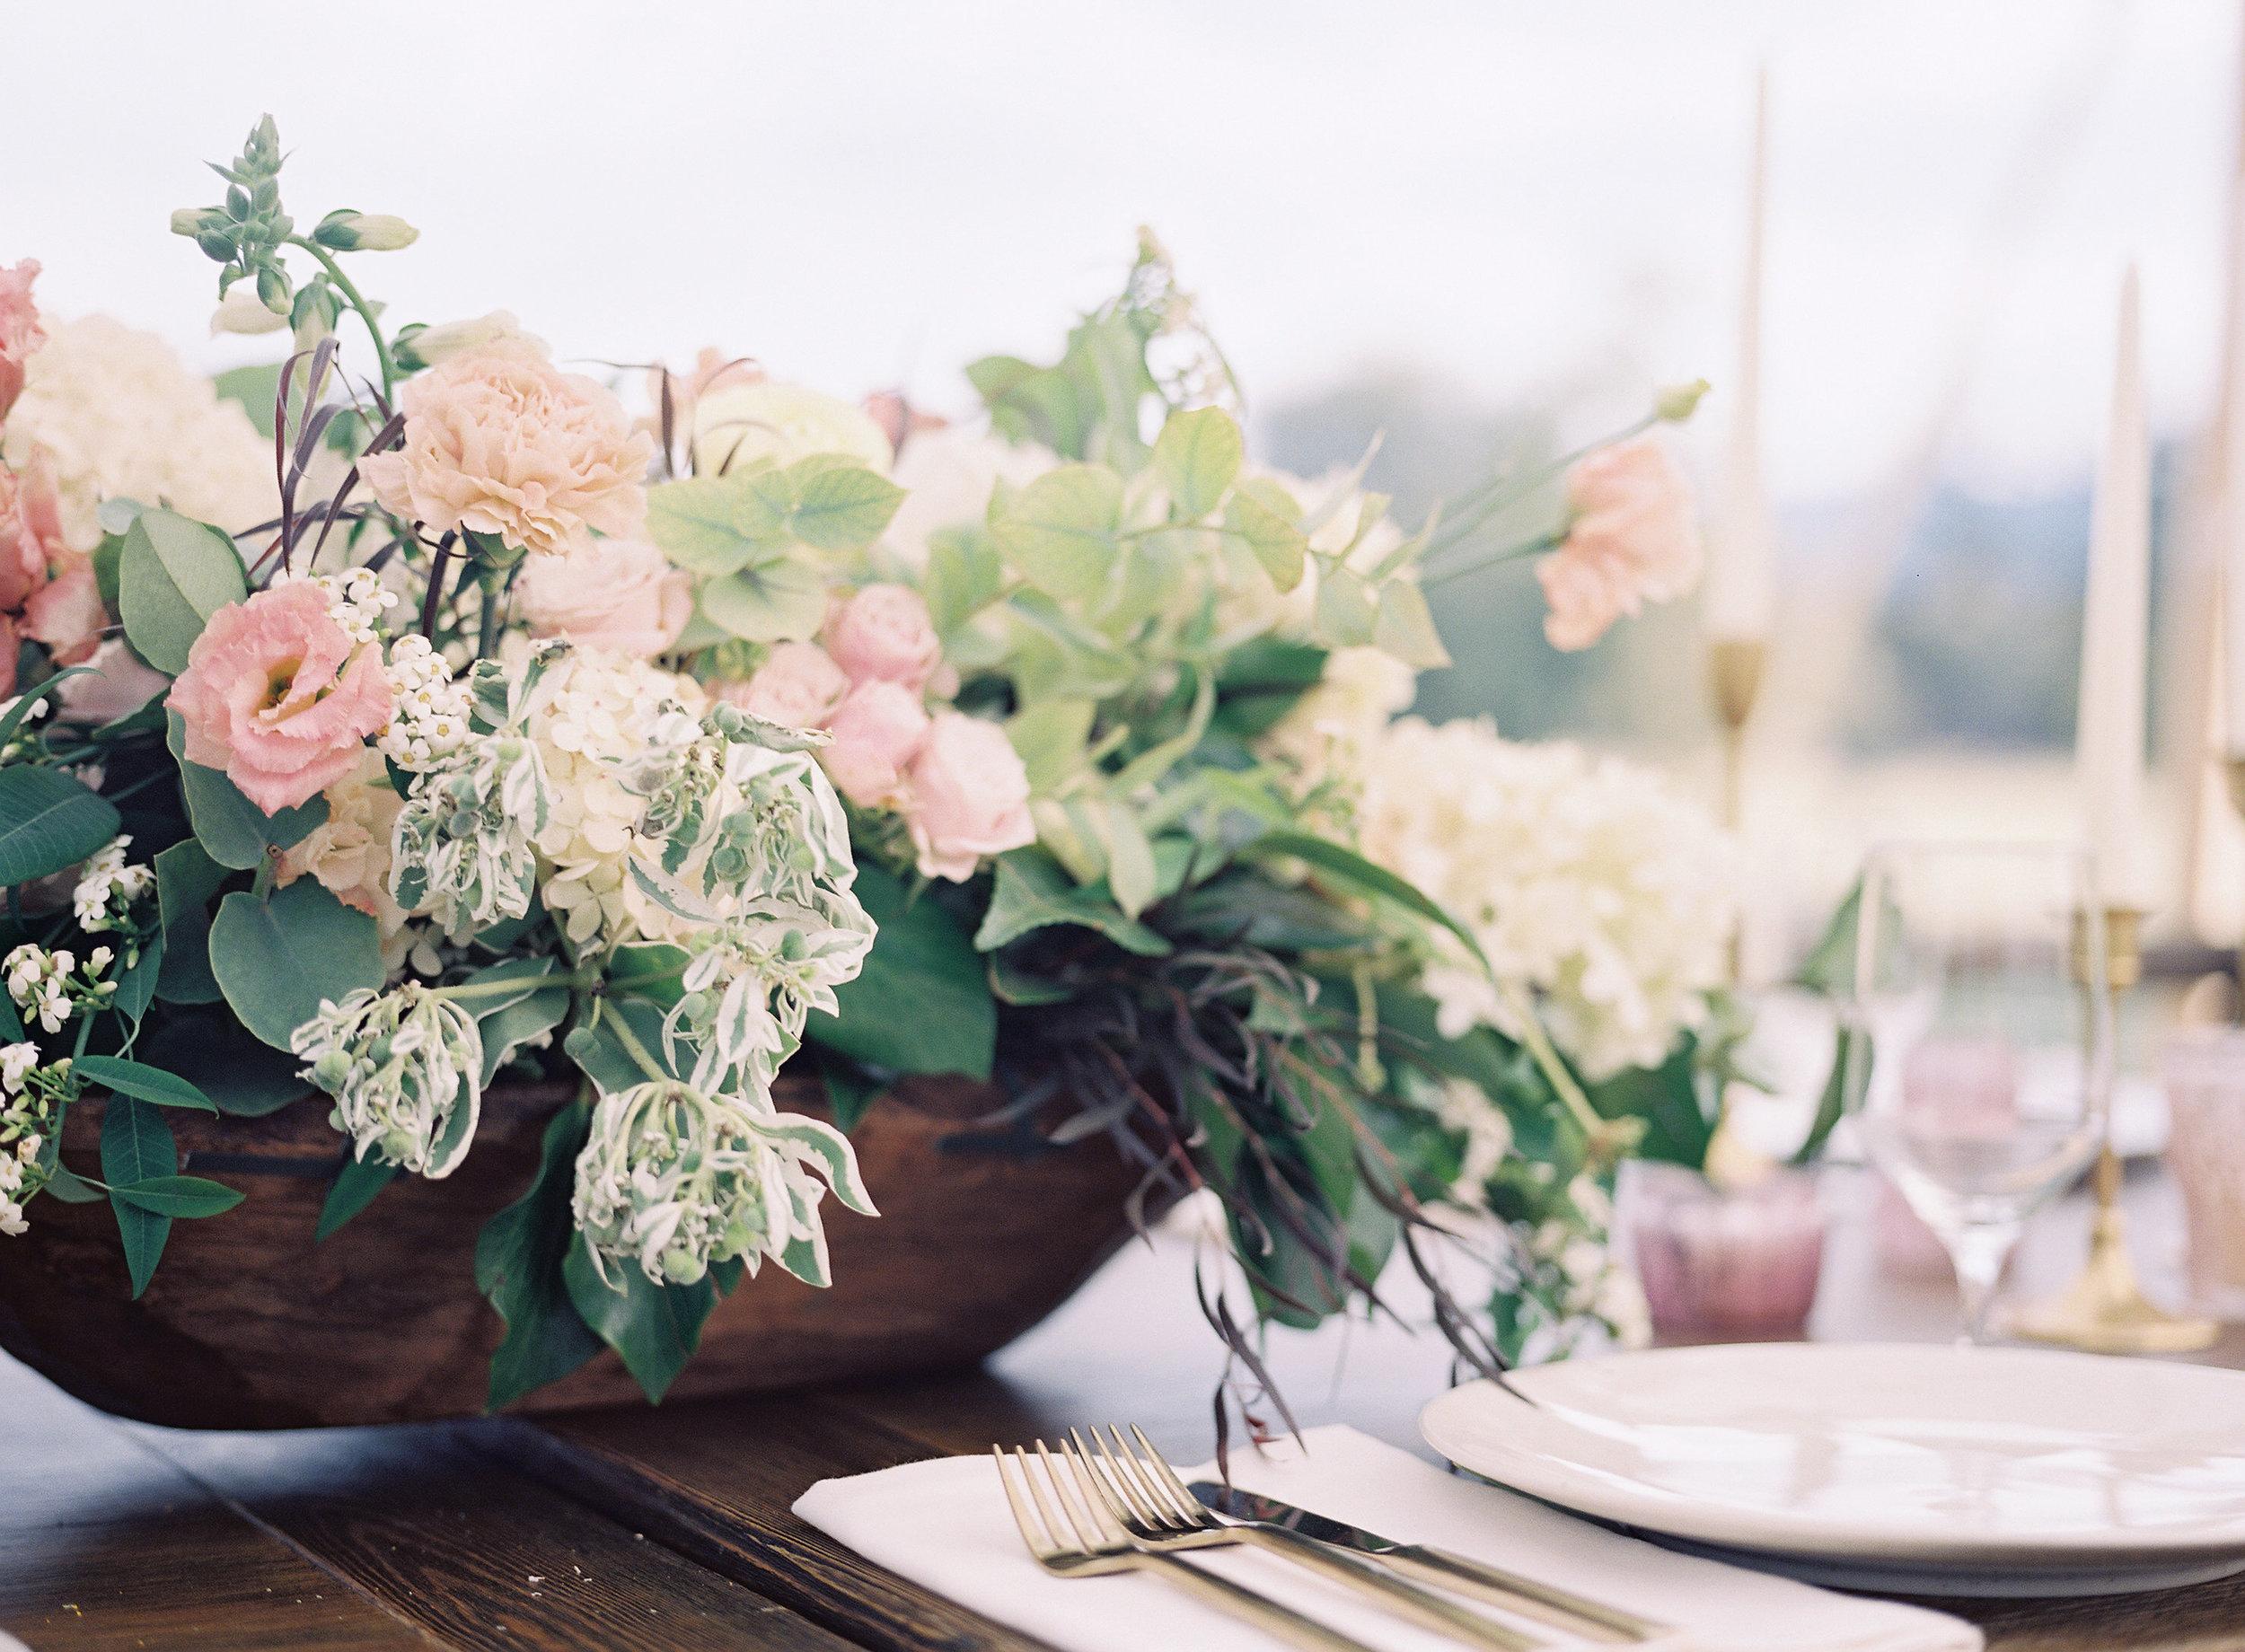 jessica-zimmerman-events-heather-payne-shay-and-hannah-wedding-reception-arrangement.jpg